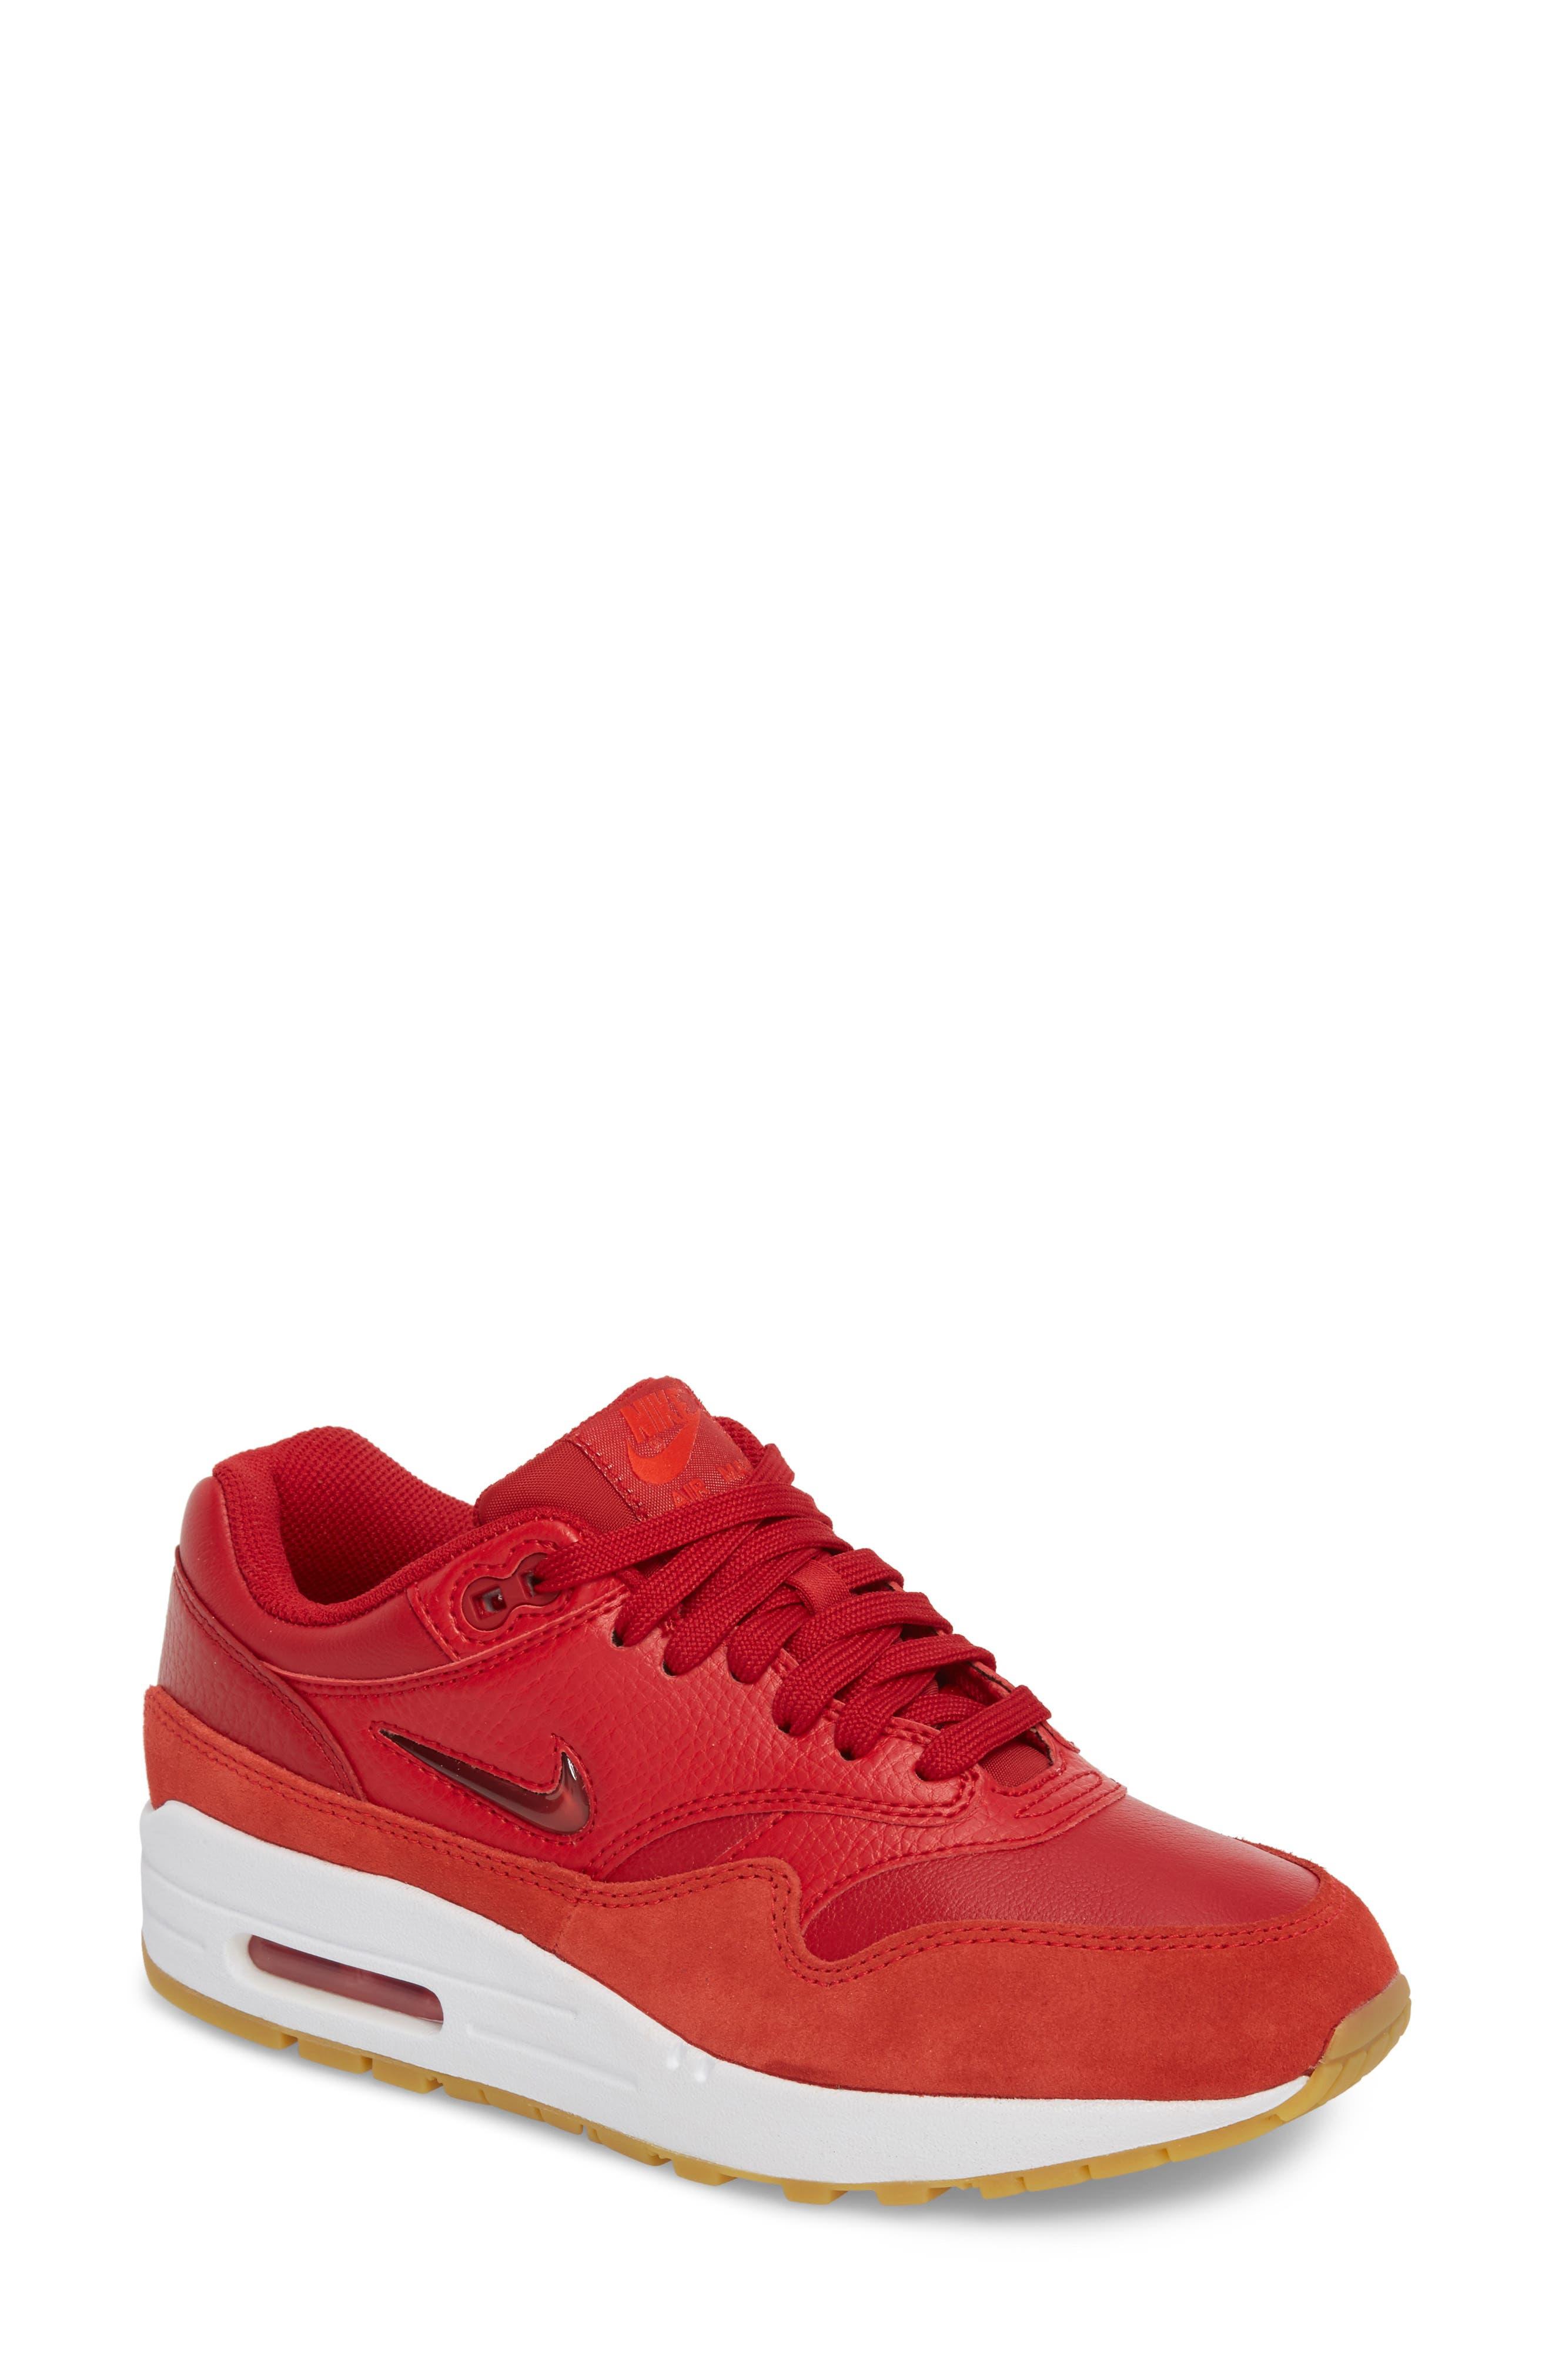 Air Max 1 Premium SC Sneaker,                             Main thumbnail 1, color,                             Gym Red/ Gym Red